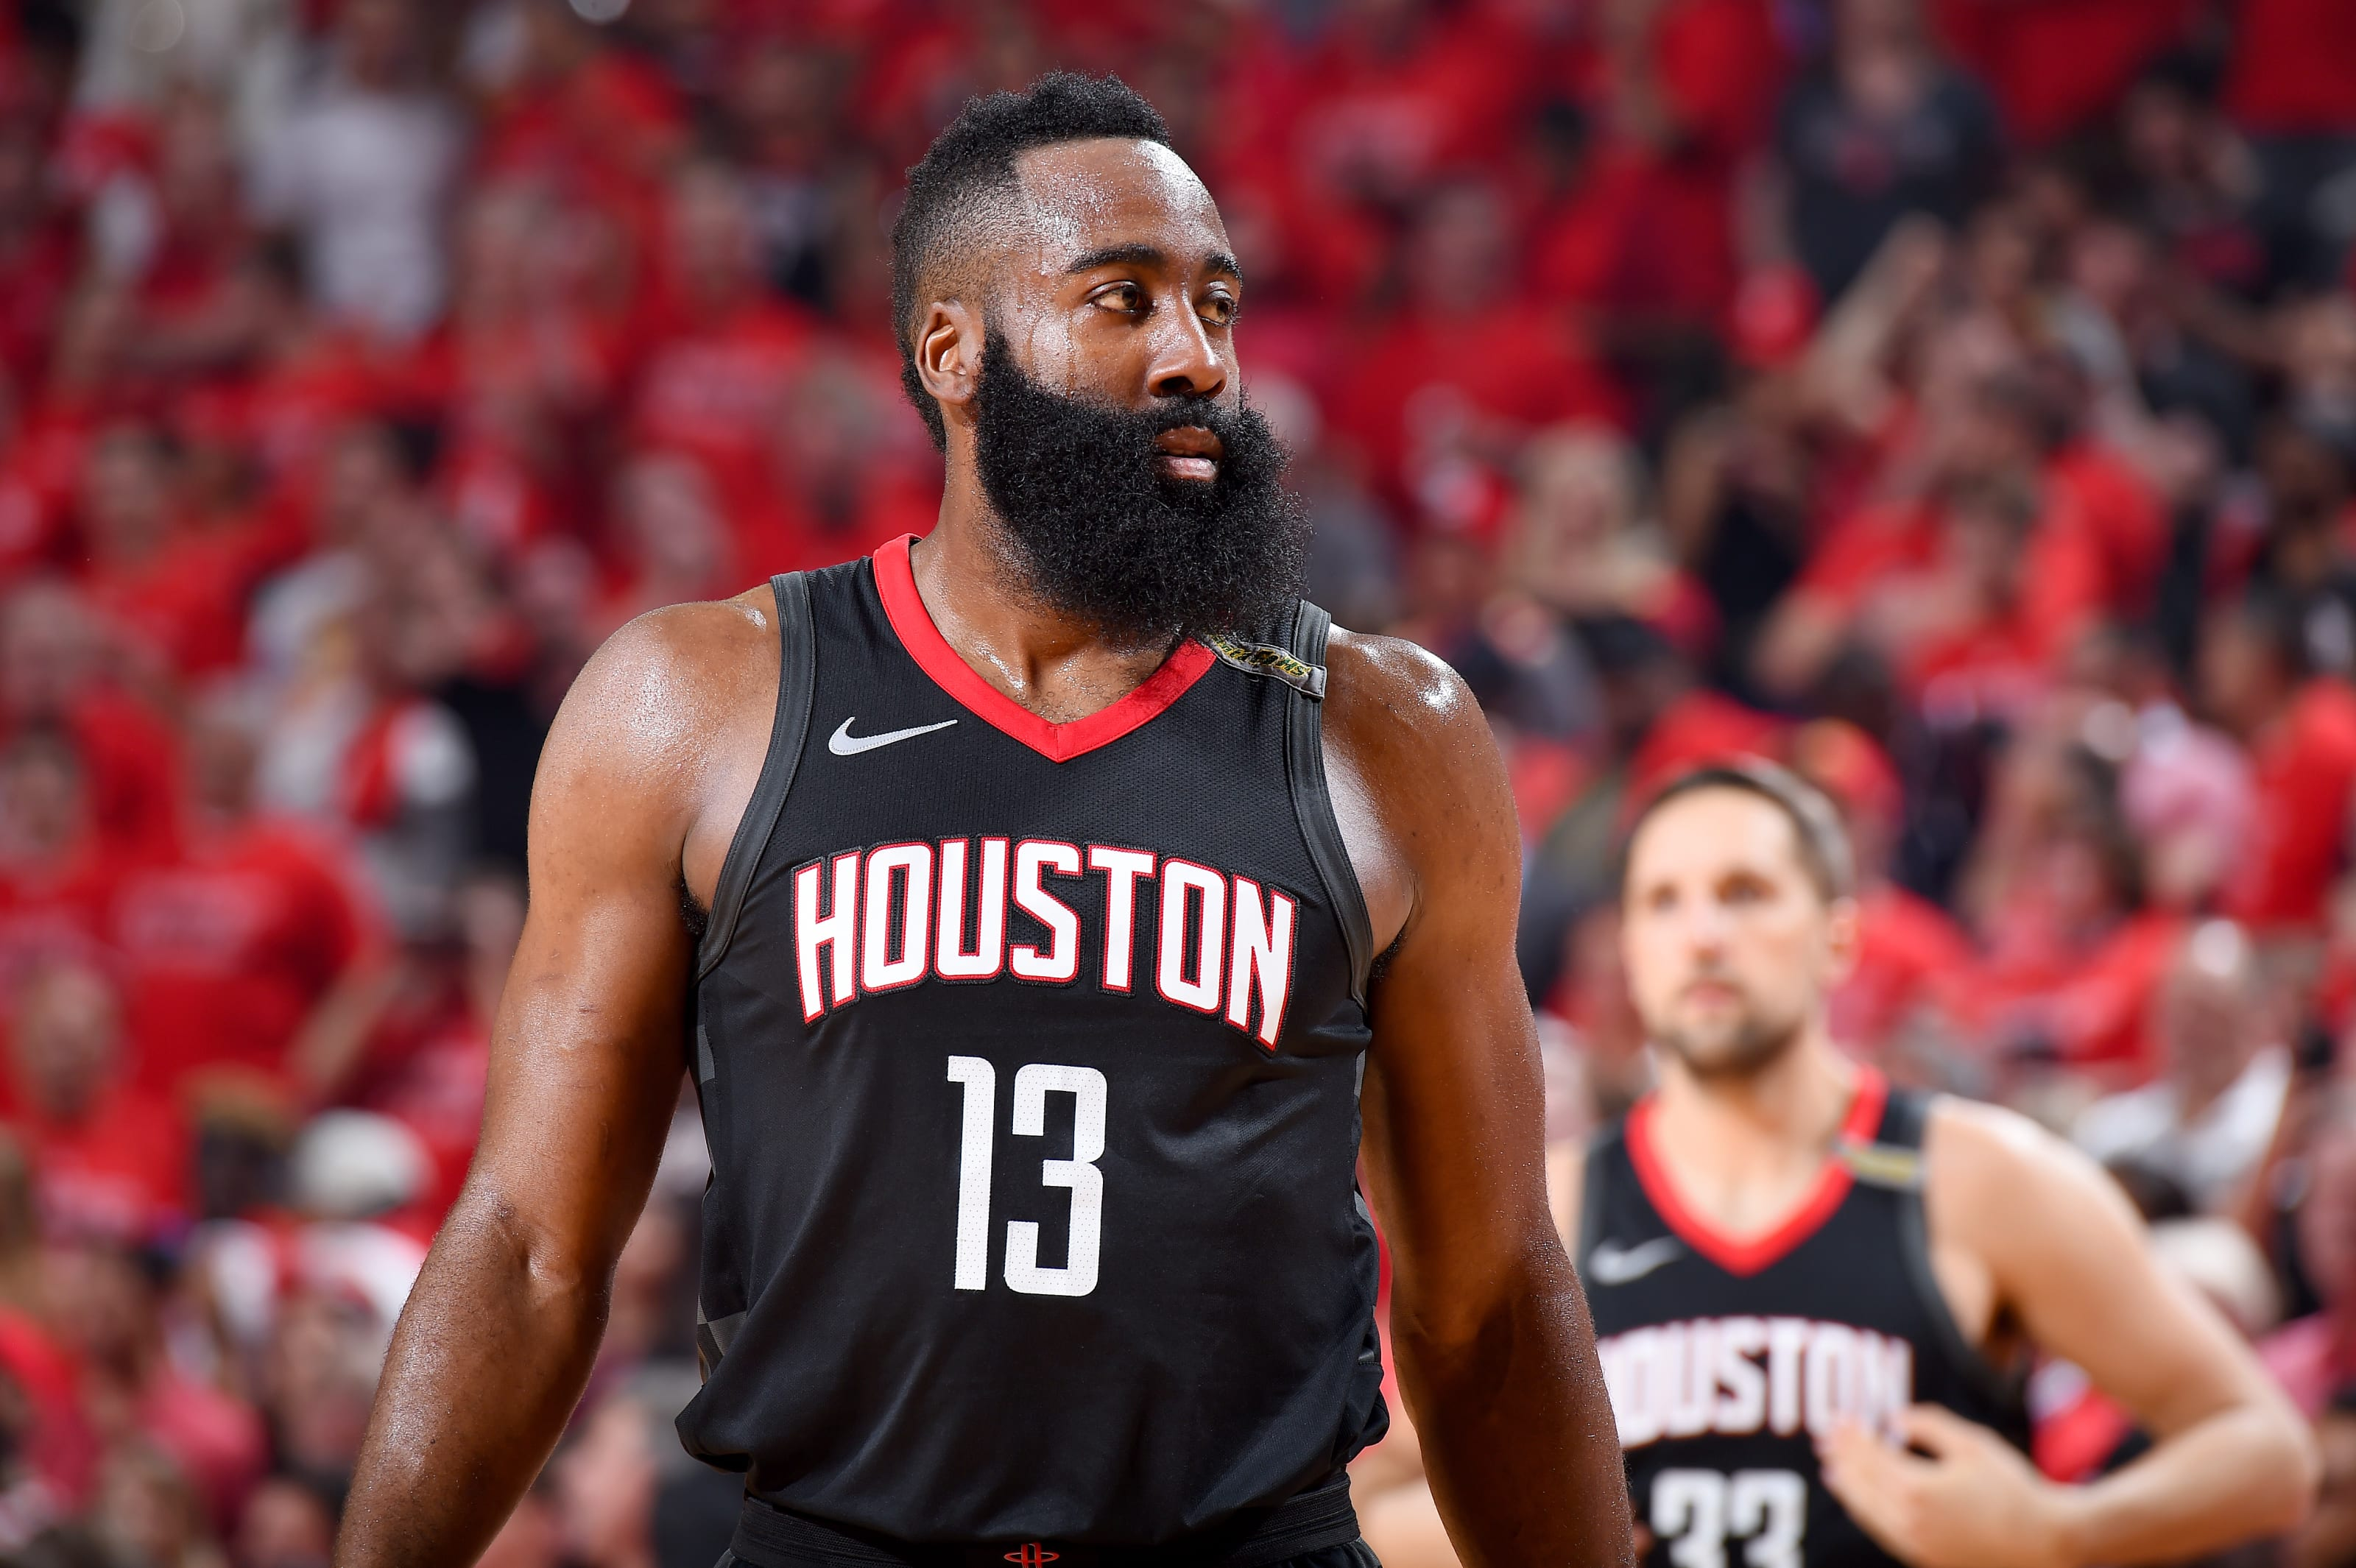 Houston Rockets: 2017-18 player grades for James Harden